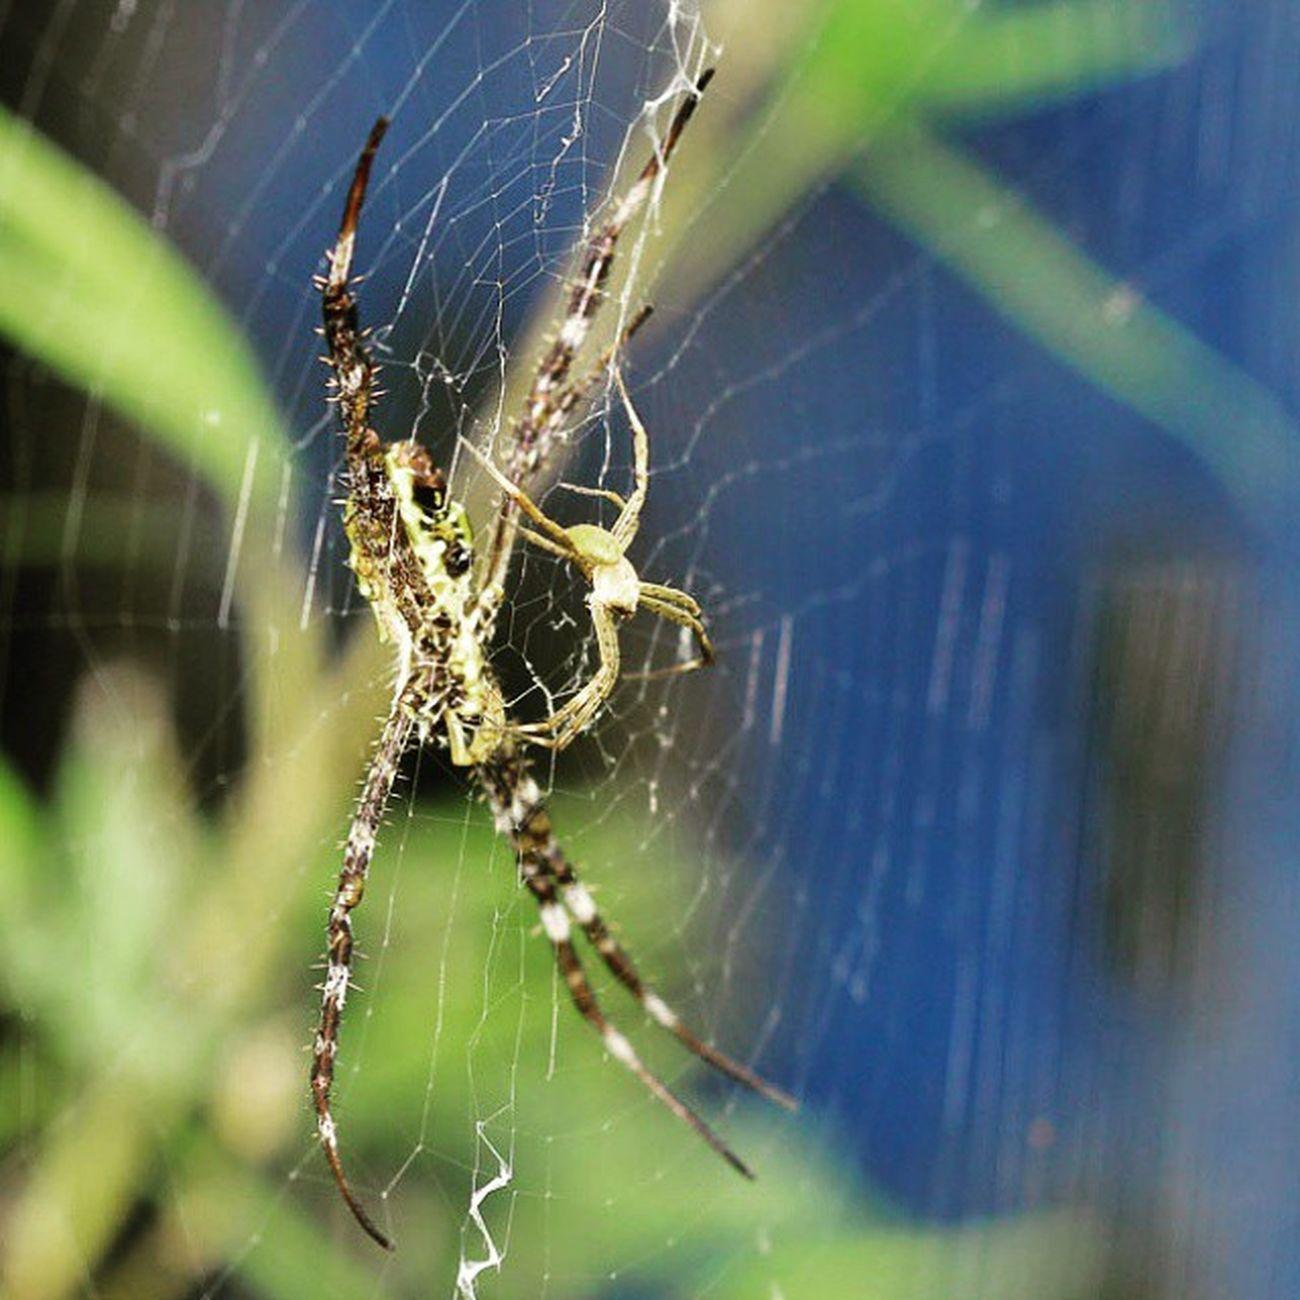 Mom and Kid. Spider Spiders Spiderworld Ig_spiders ig_spider